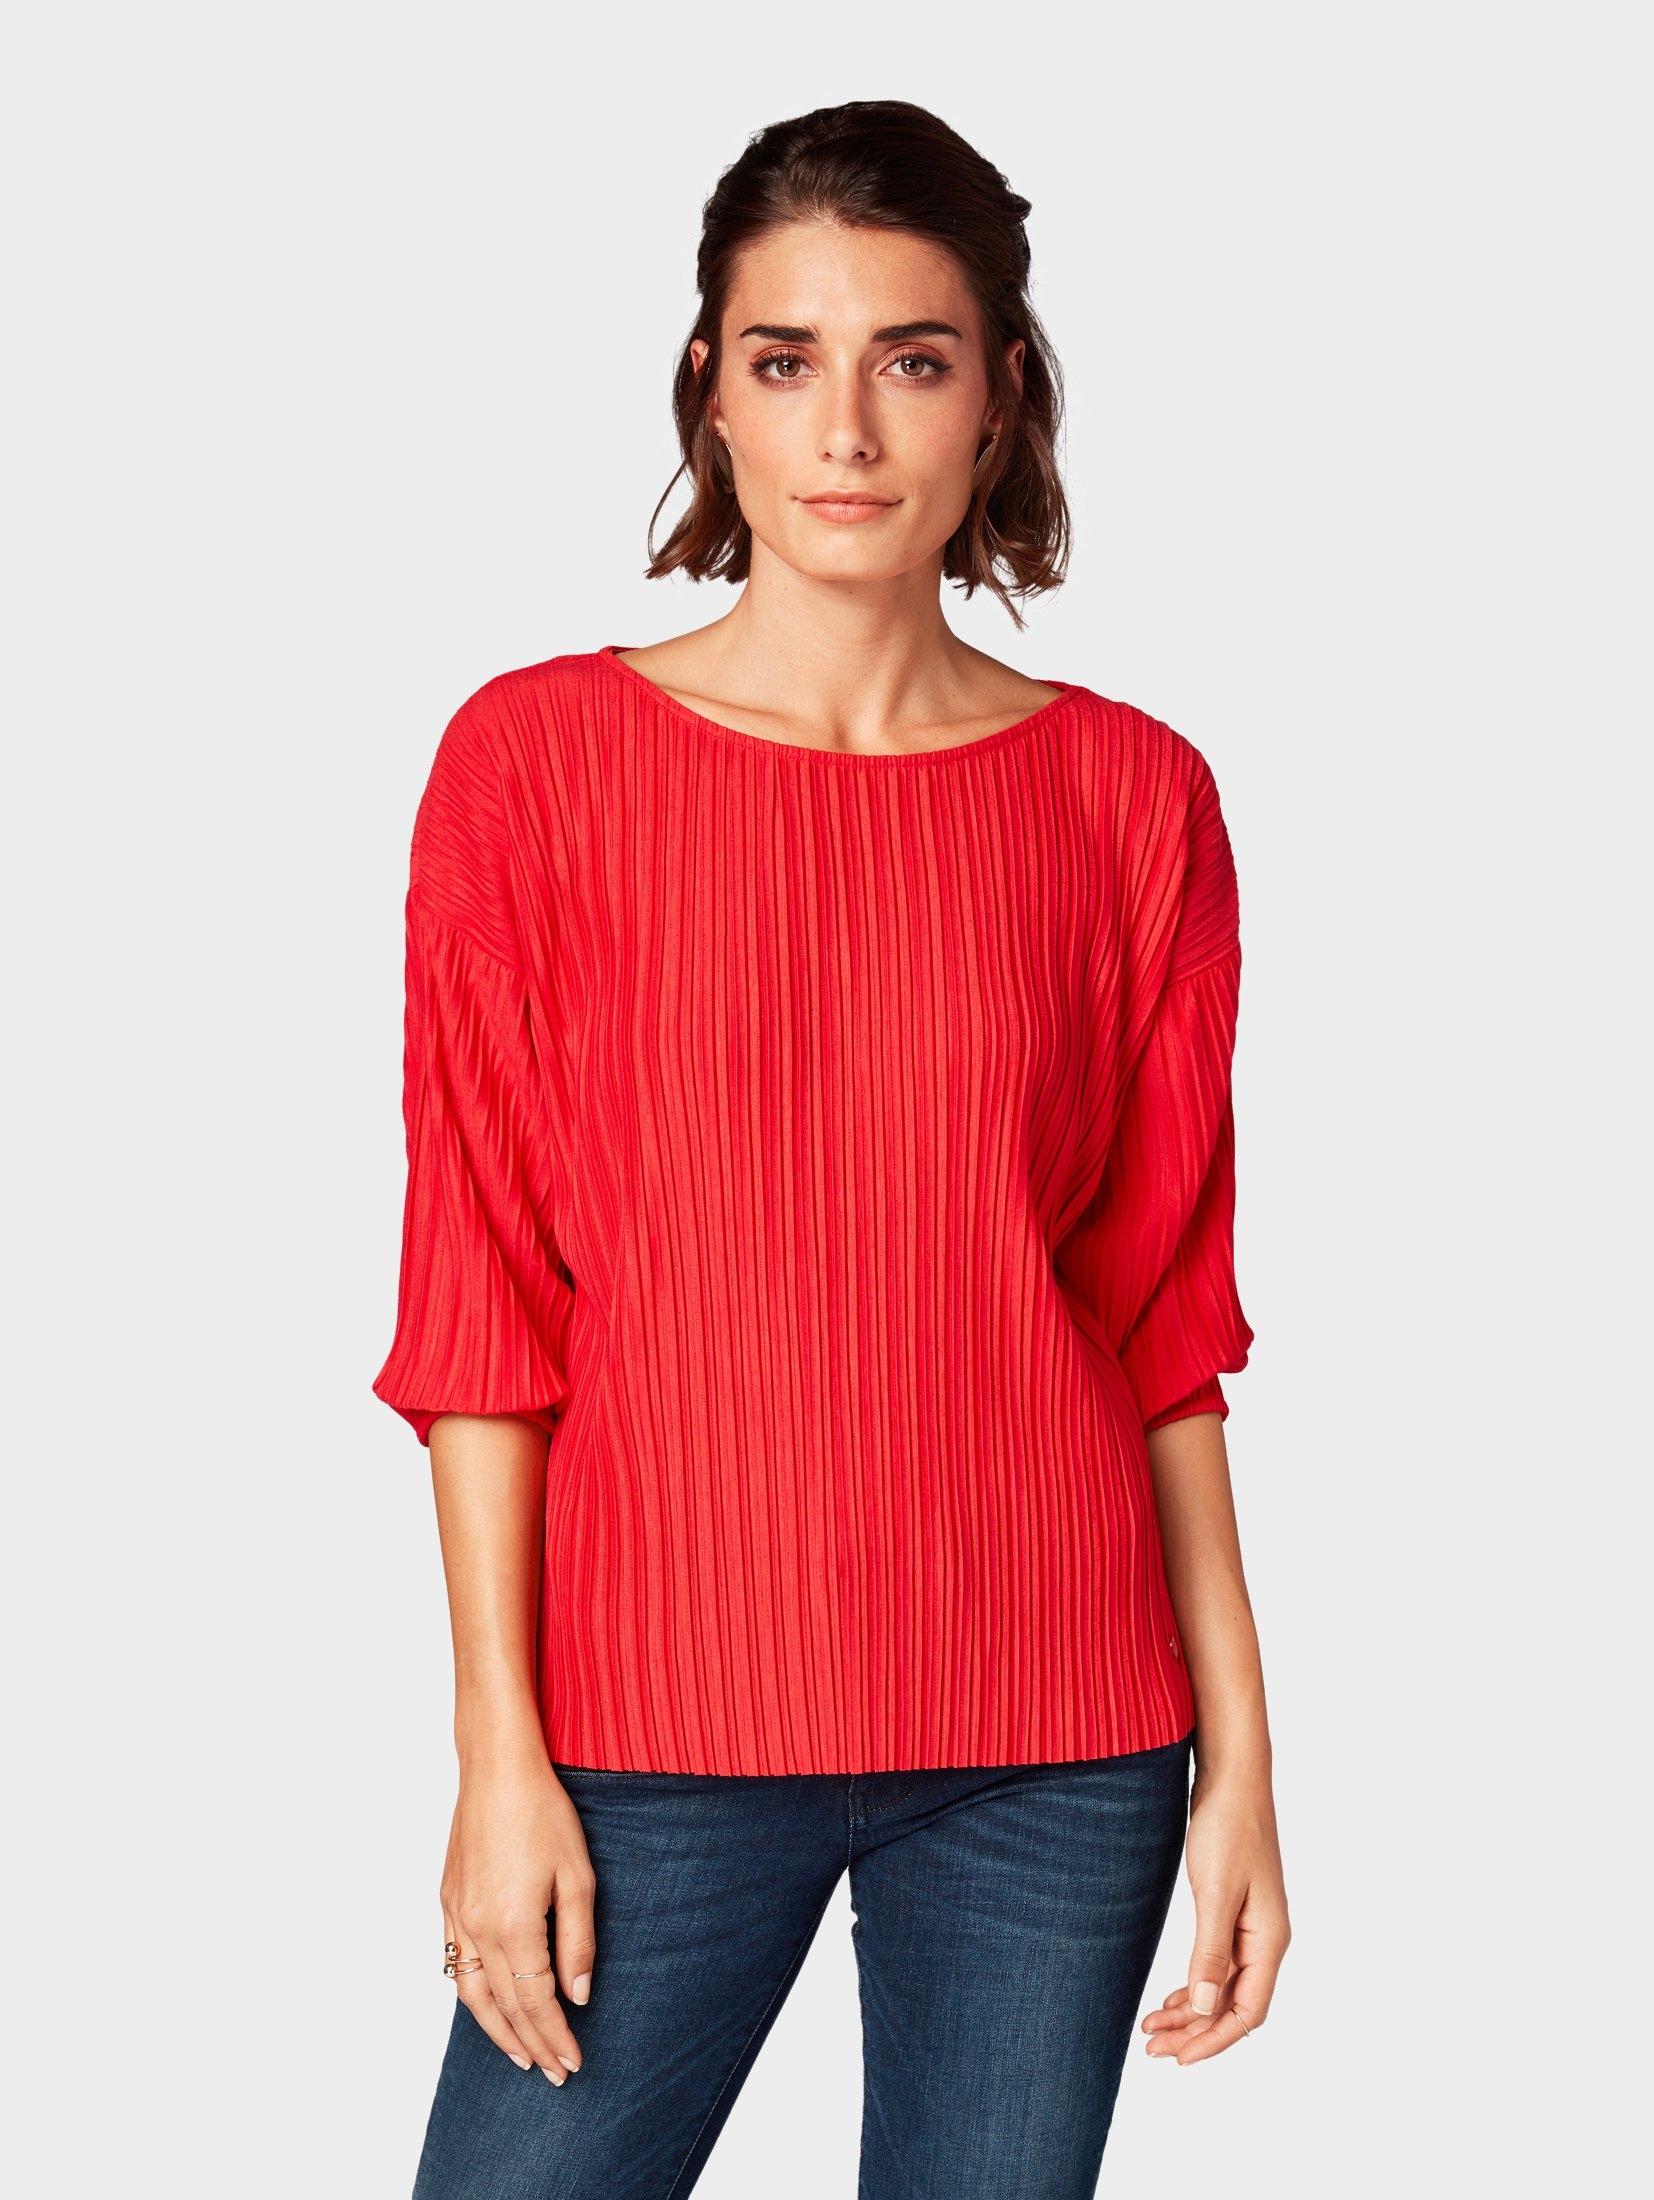 shirt Van Tailor Online Shop De Shirtt In Plissé Tom nXOkP80w